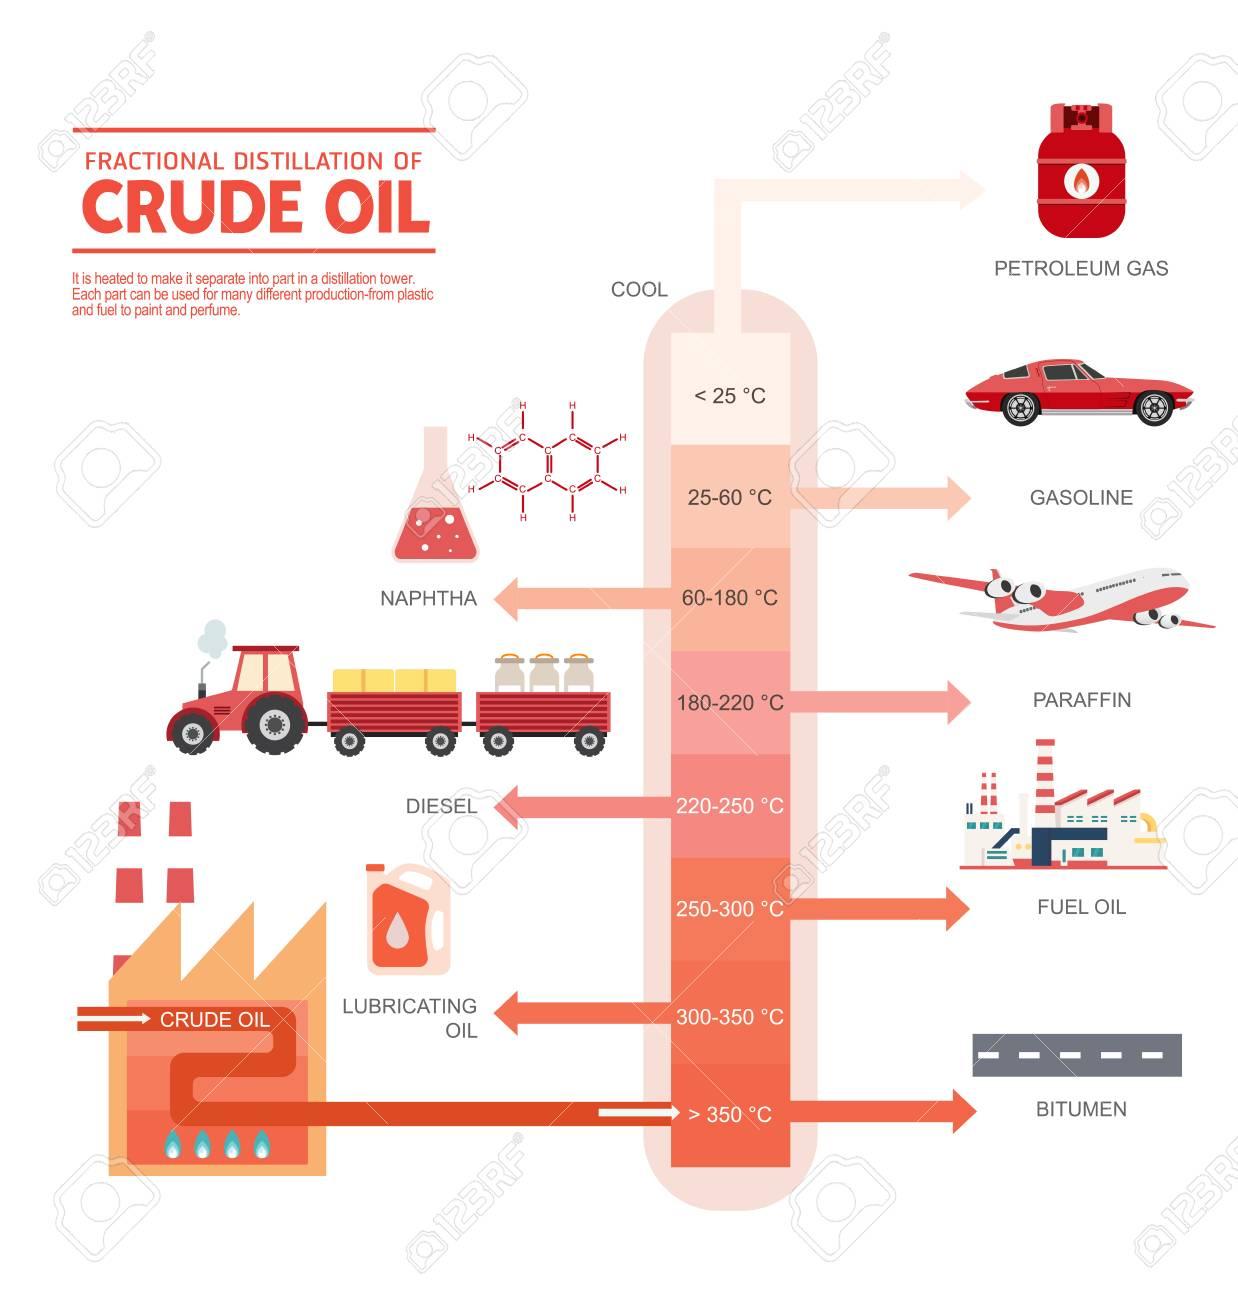 hight resolution of fractional distillation of crude oil diagram illustration stock vector 89121115